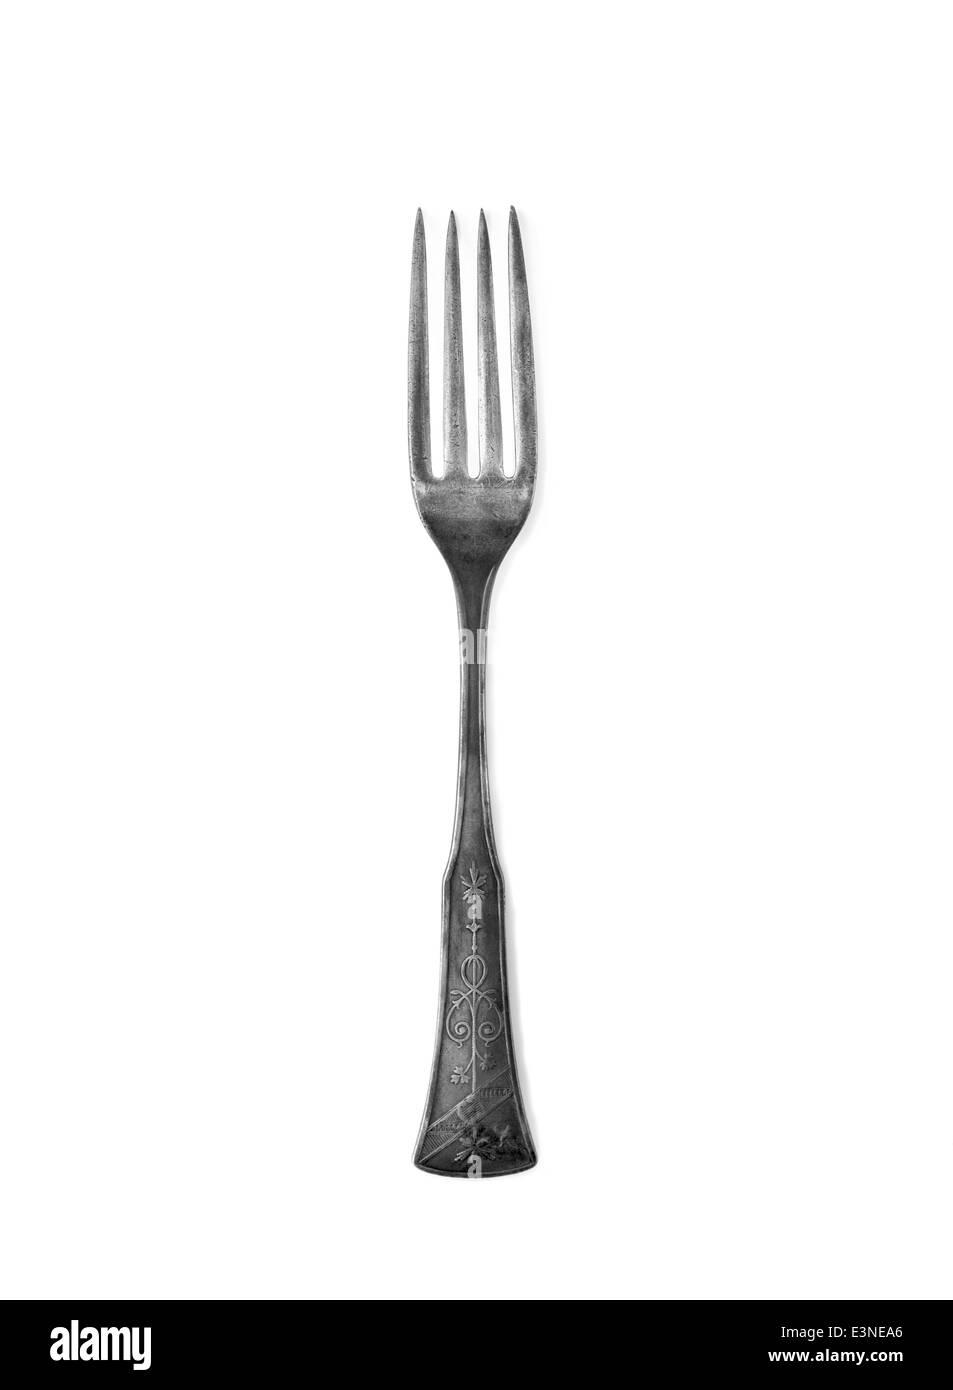 Vintage Kitchen Fork on a white background - Stock Image